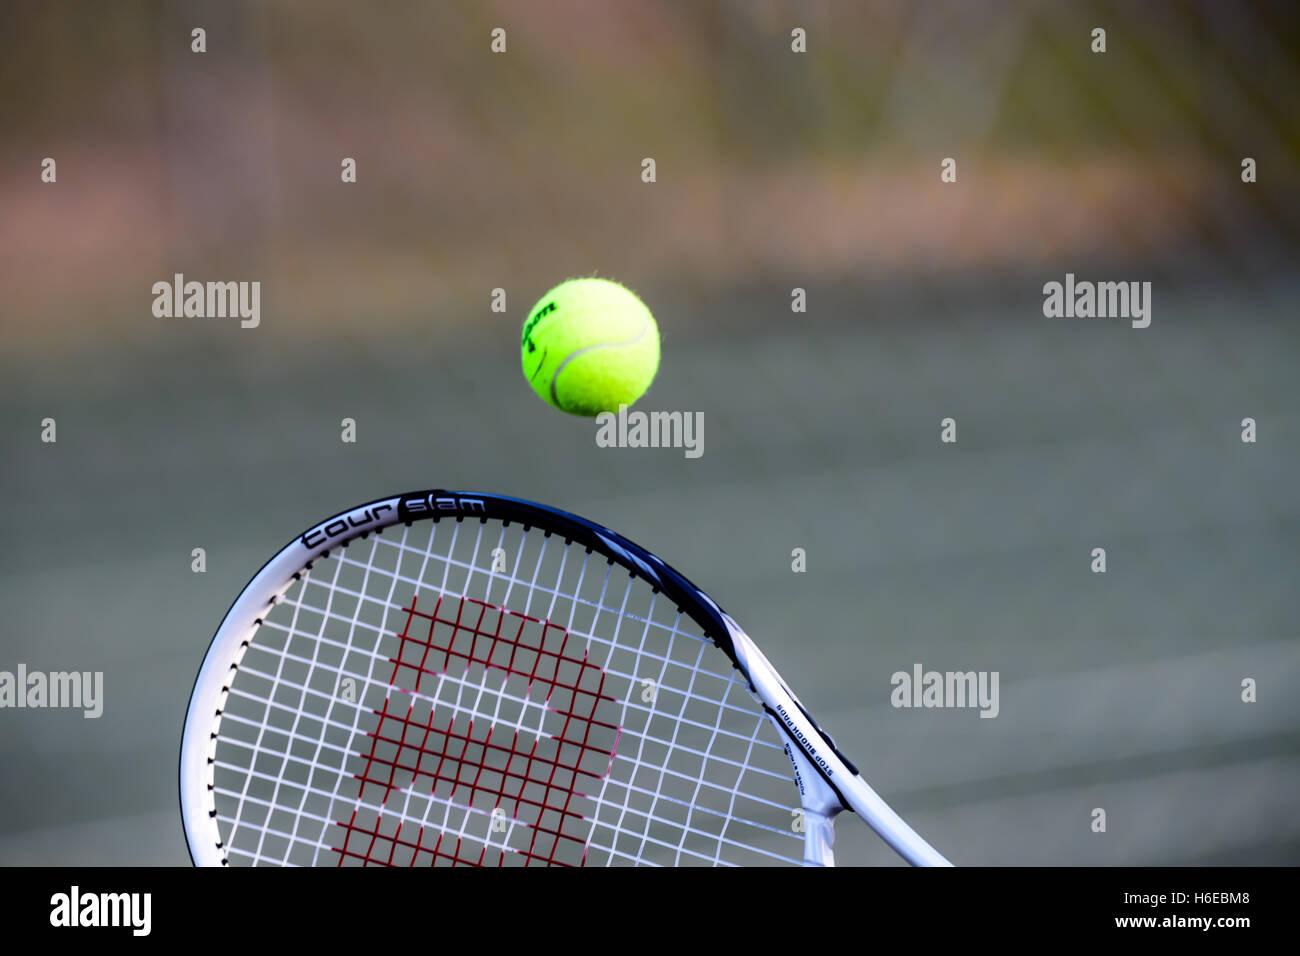 Una raqueta golpeando una pelota de tenis Imagen De Stock